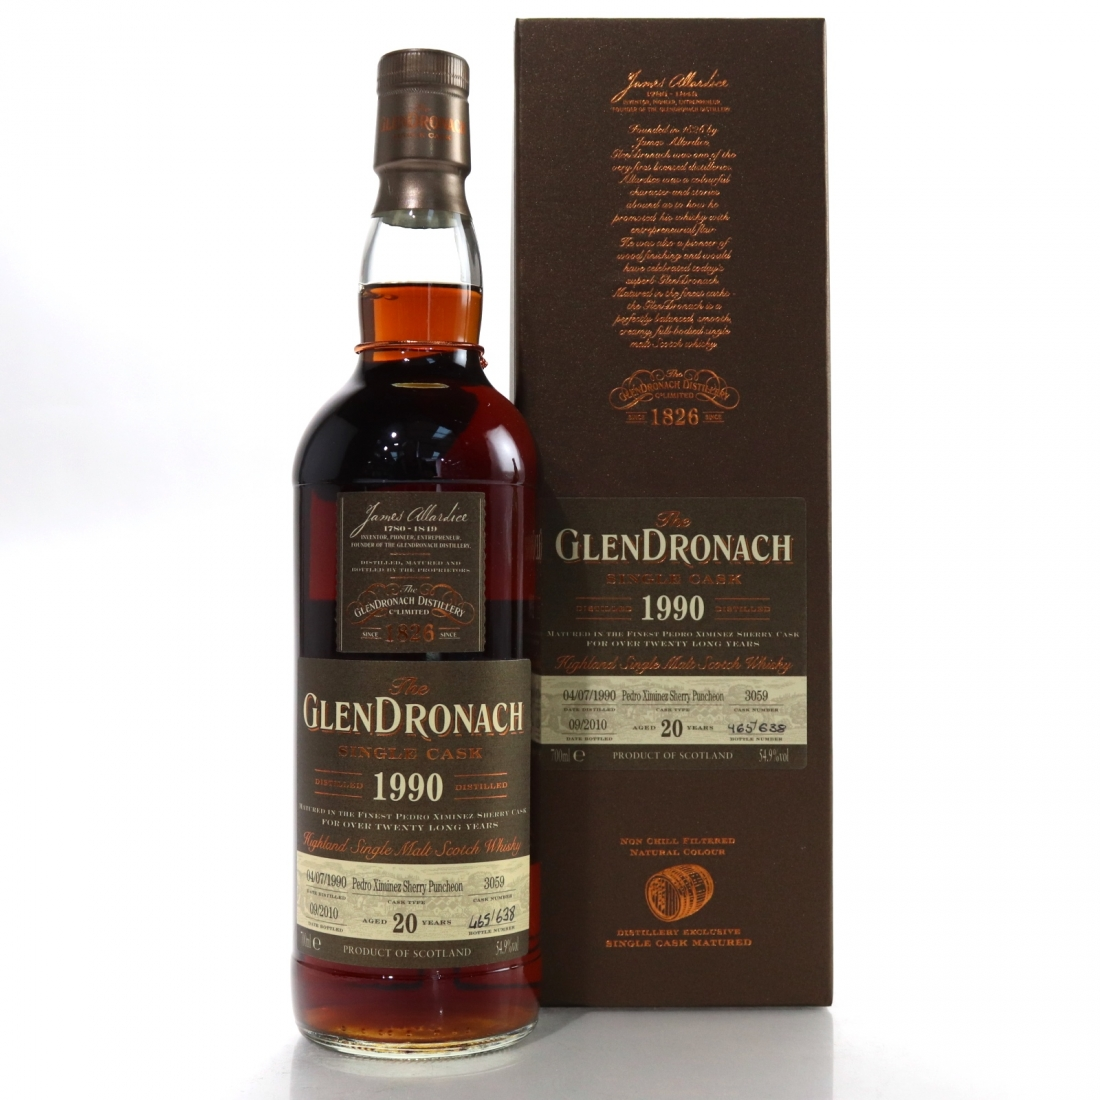 Glendronach 1990 Single Cask 20 Year Old #3059